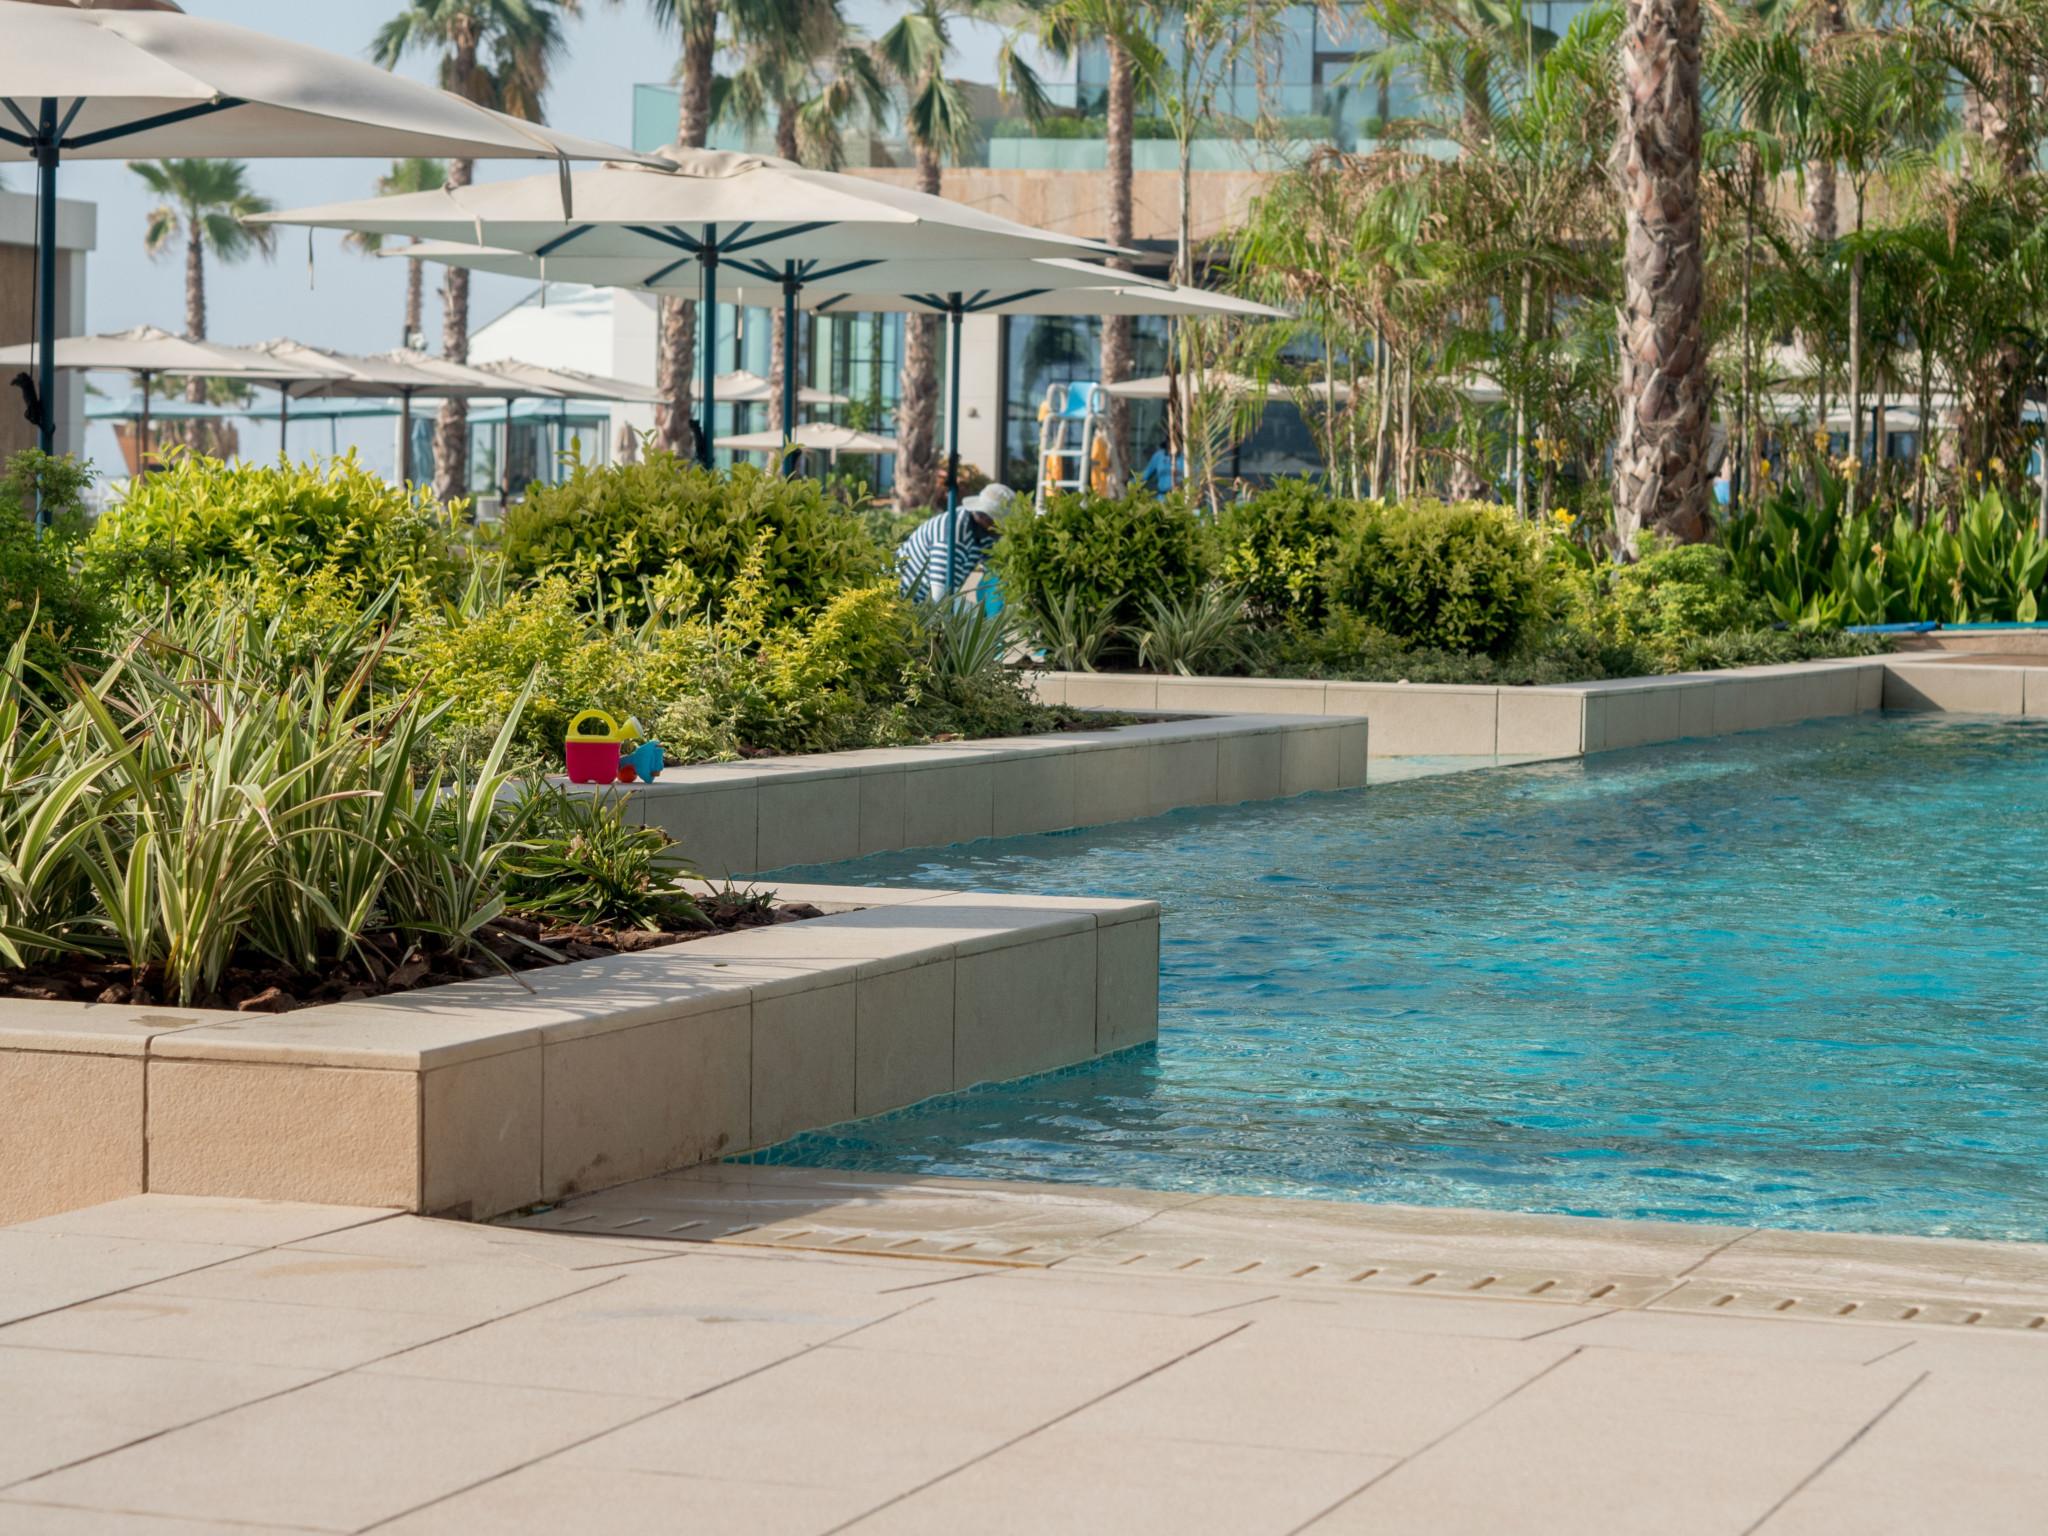 Mandarin Oriental Dubai swimming pool area